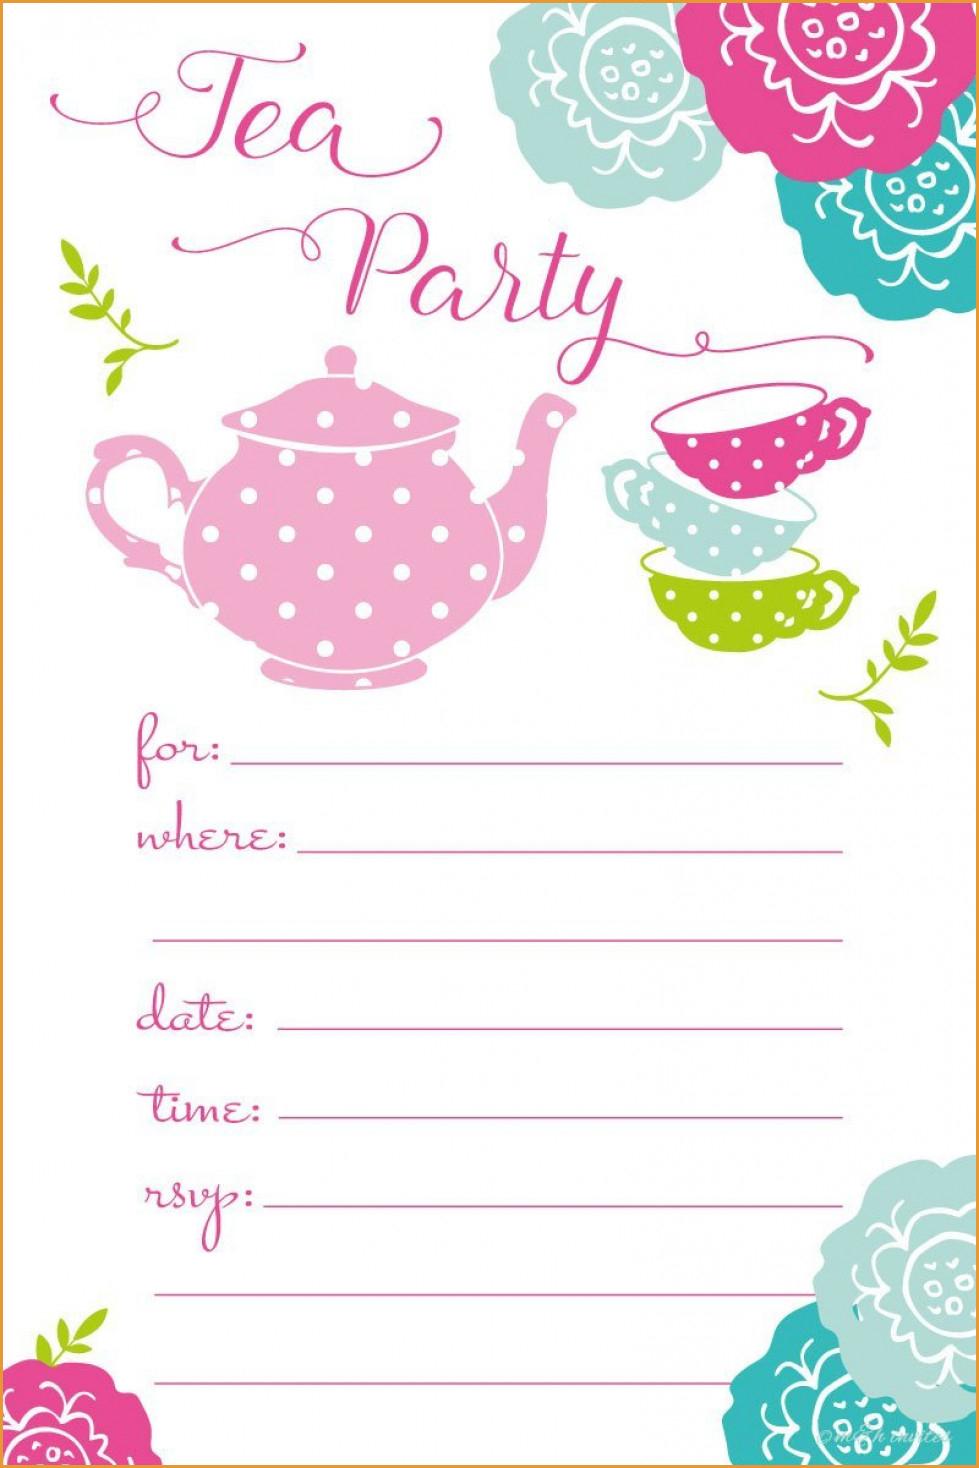 Party Invitations: Tea Party Invitations Adult Tea Party Invitations - Free Printable Polka Dot Birthday Party Invitations